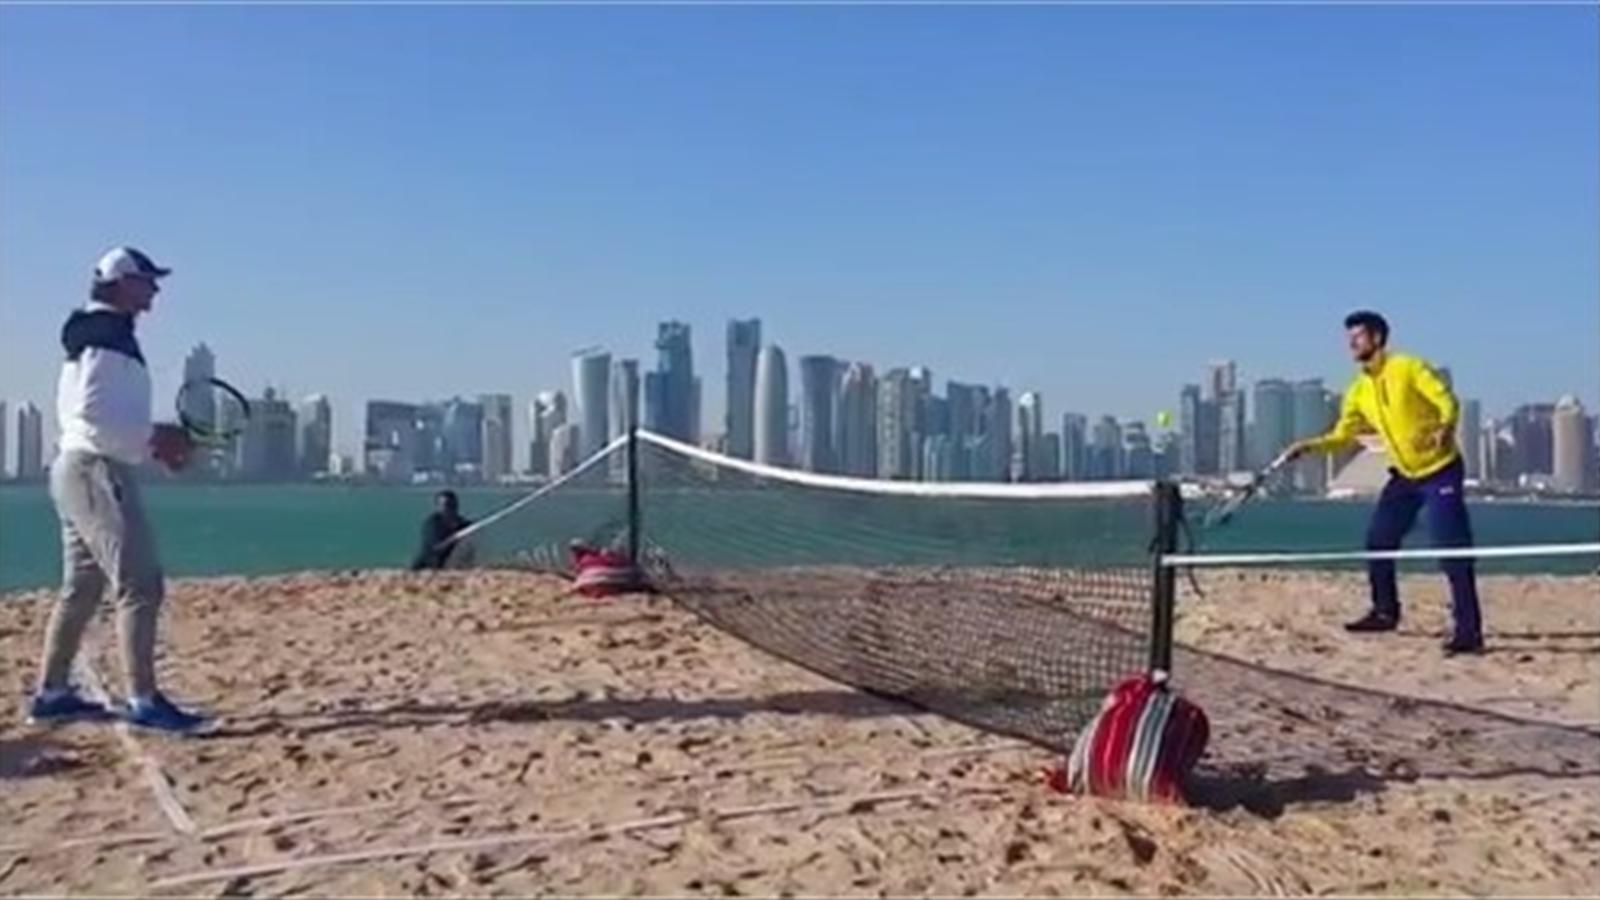 Novak Djokovic and Rafael Nadal playing beach tennis ahead of the Qatar Open (Twitter)